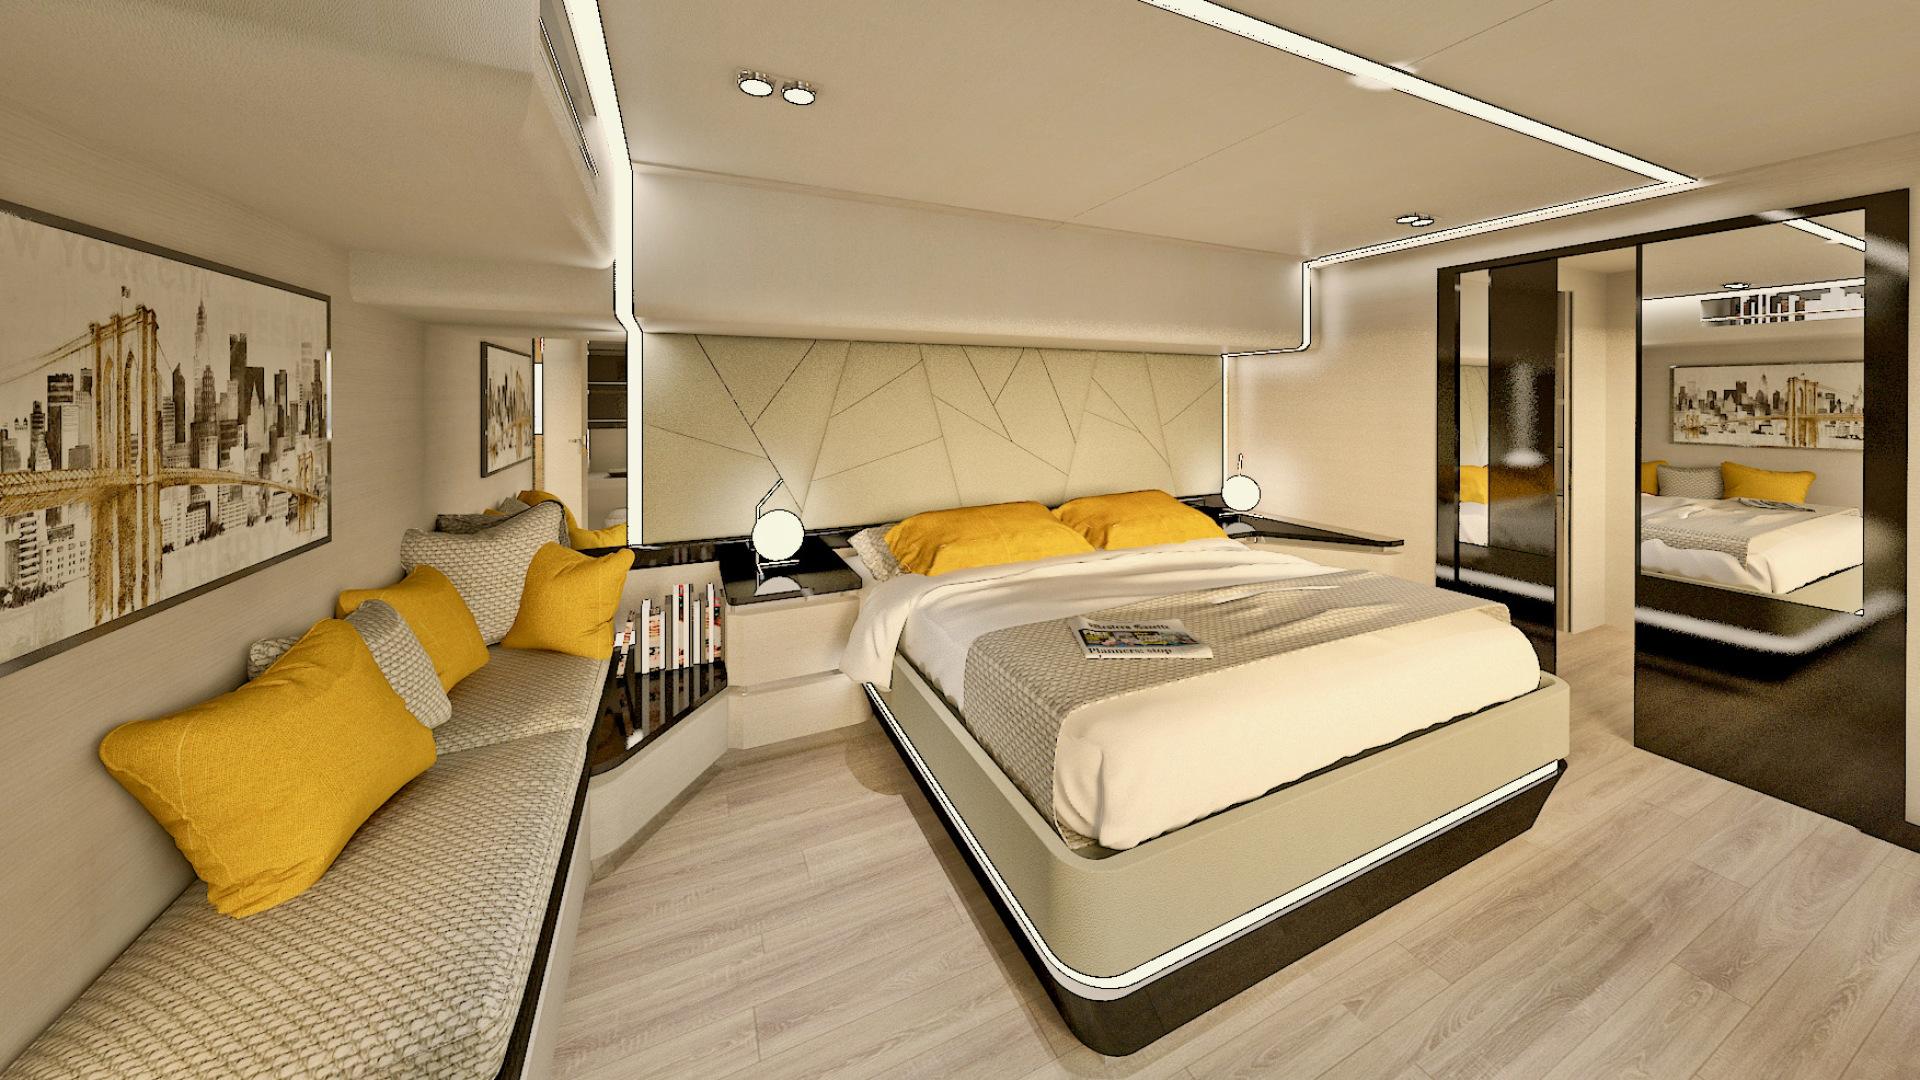 Silent-Yachts-Silent 80  2020-SILENT 80 Ancona-Italy-Master Stateroom-1262446 | Thumbnail